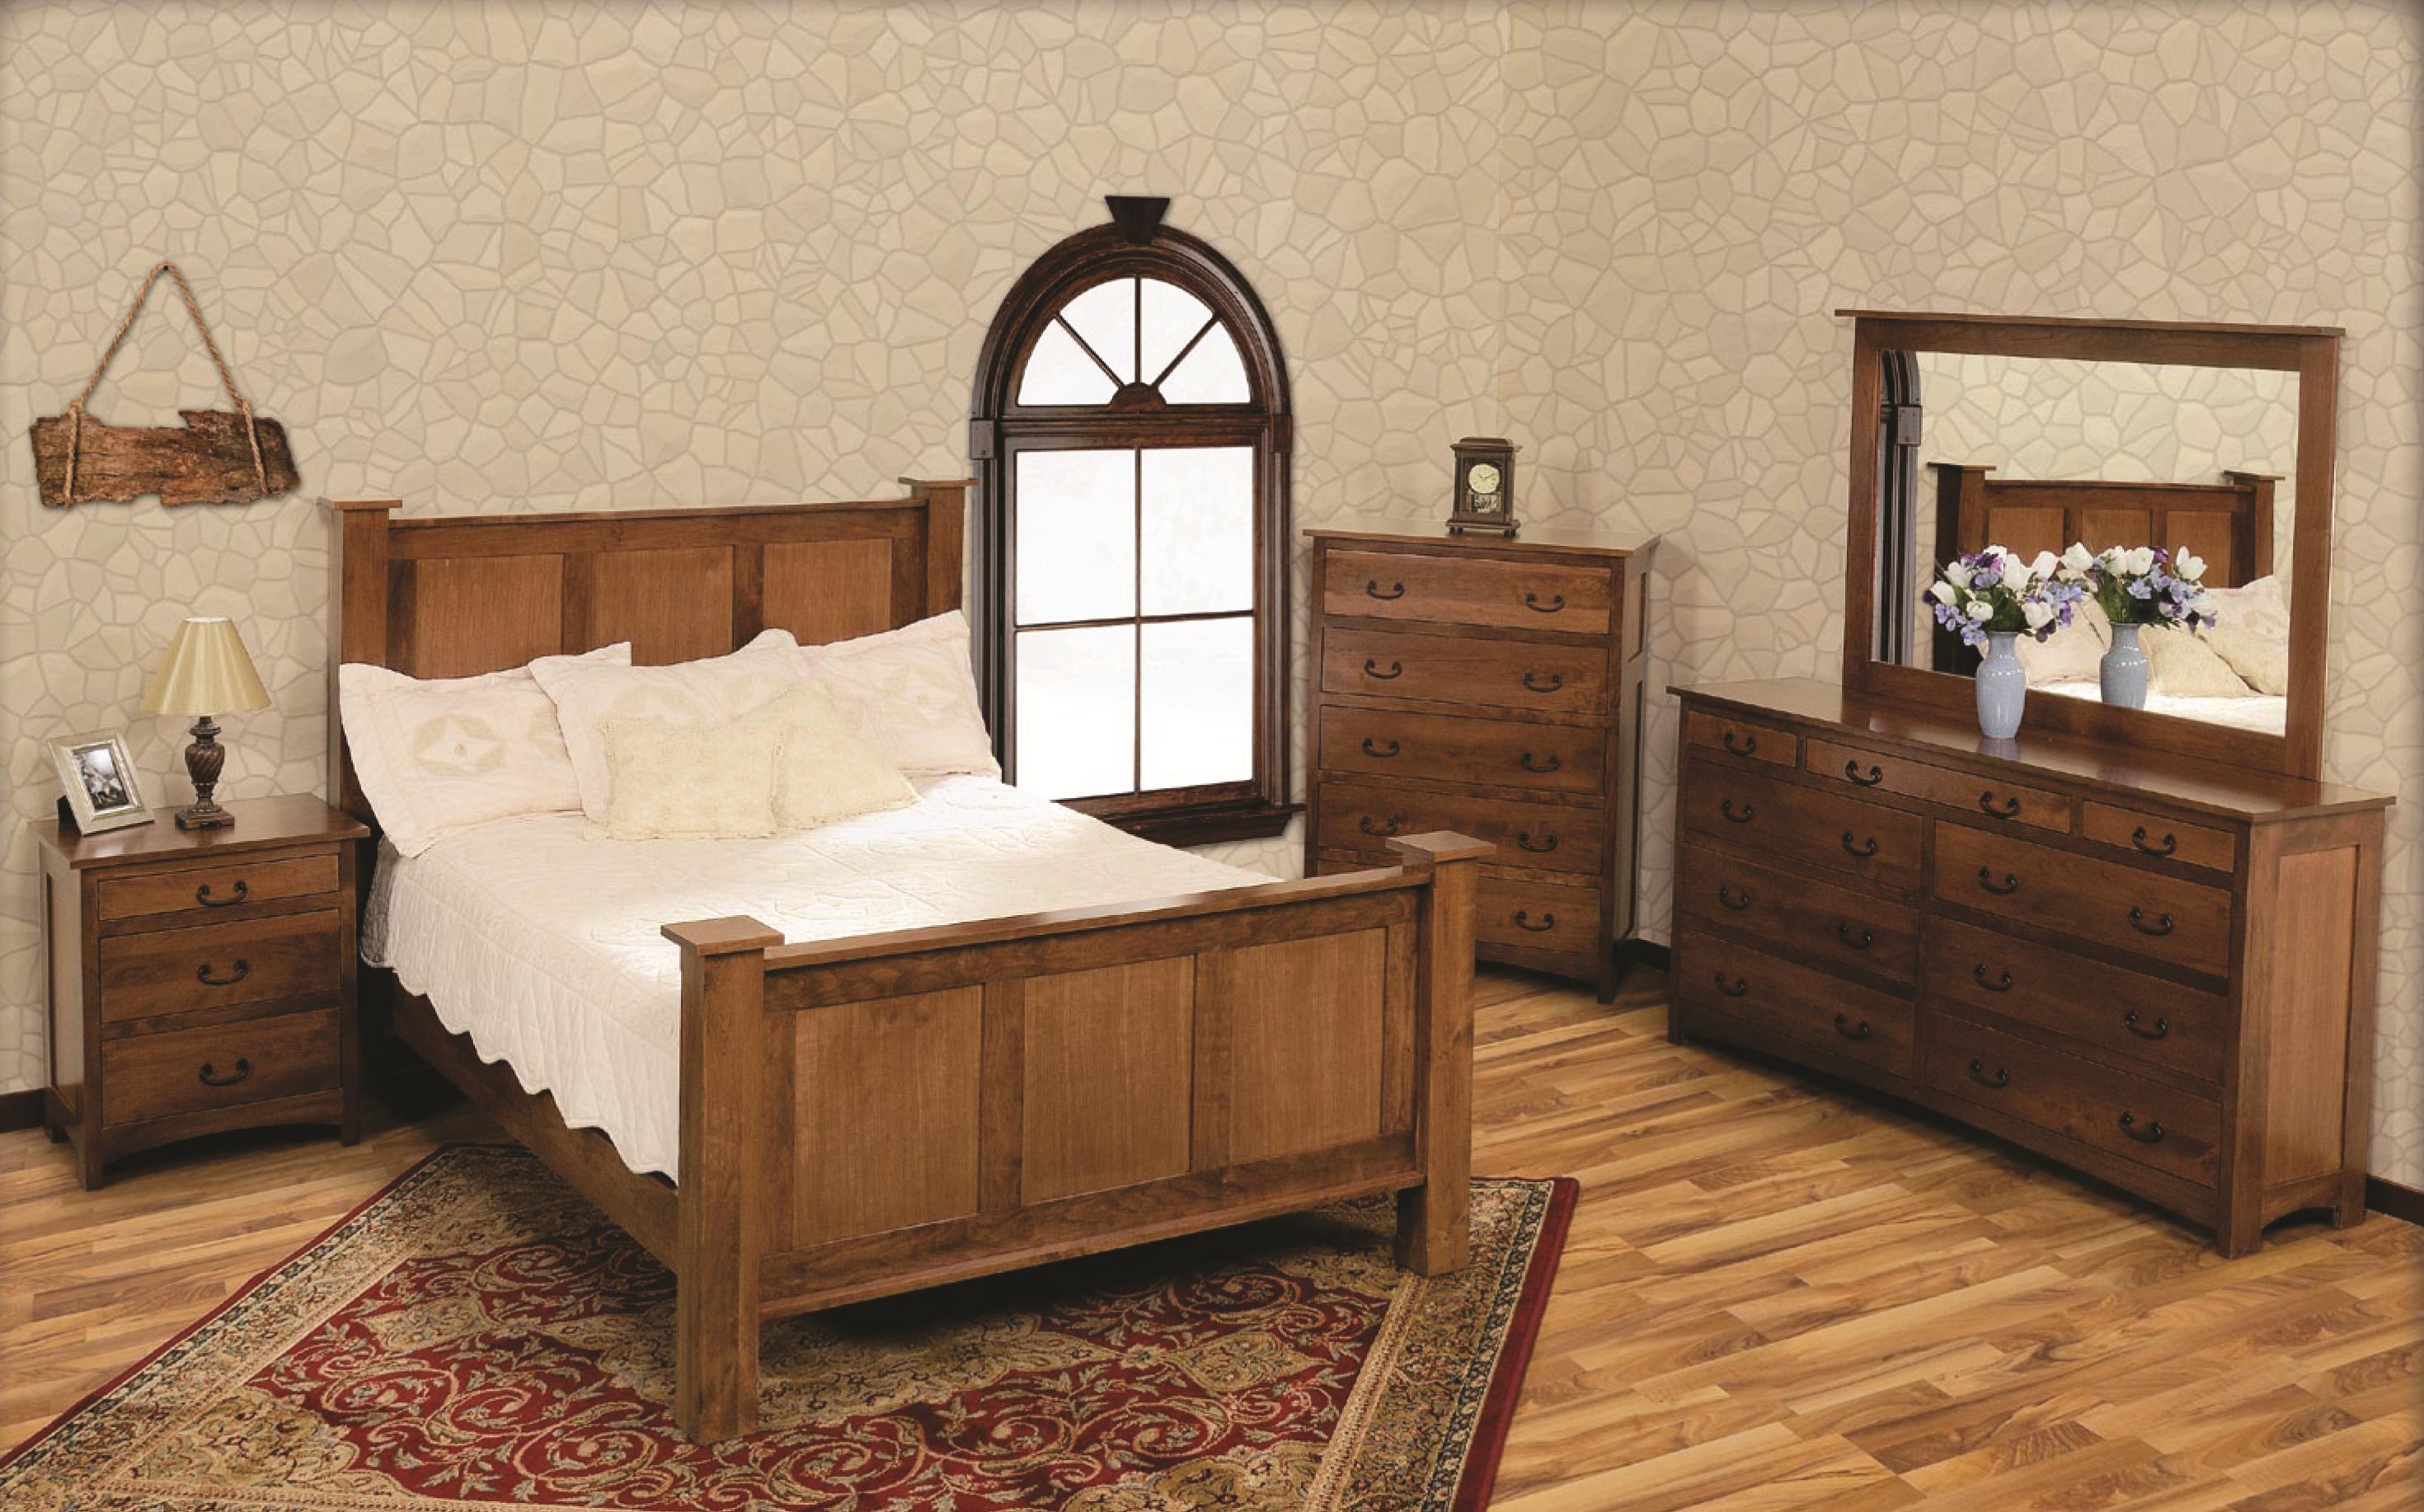 Superieur Sadleru0027s Home Furnishings